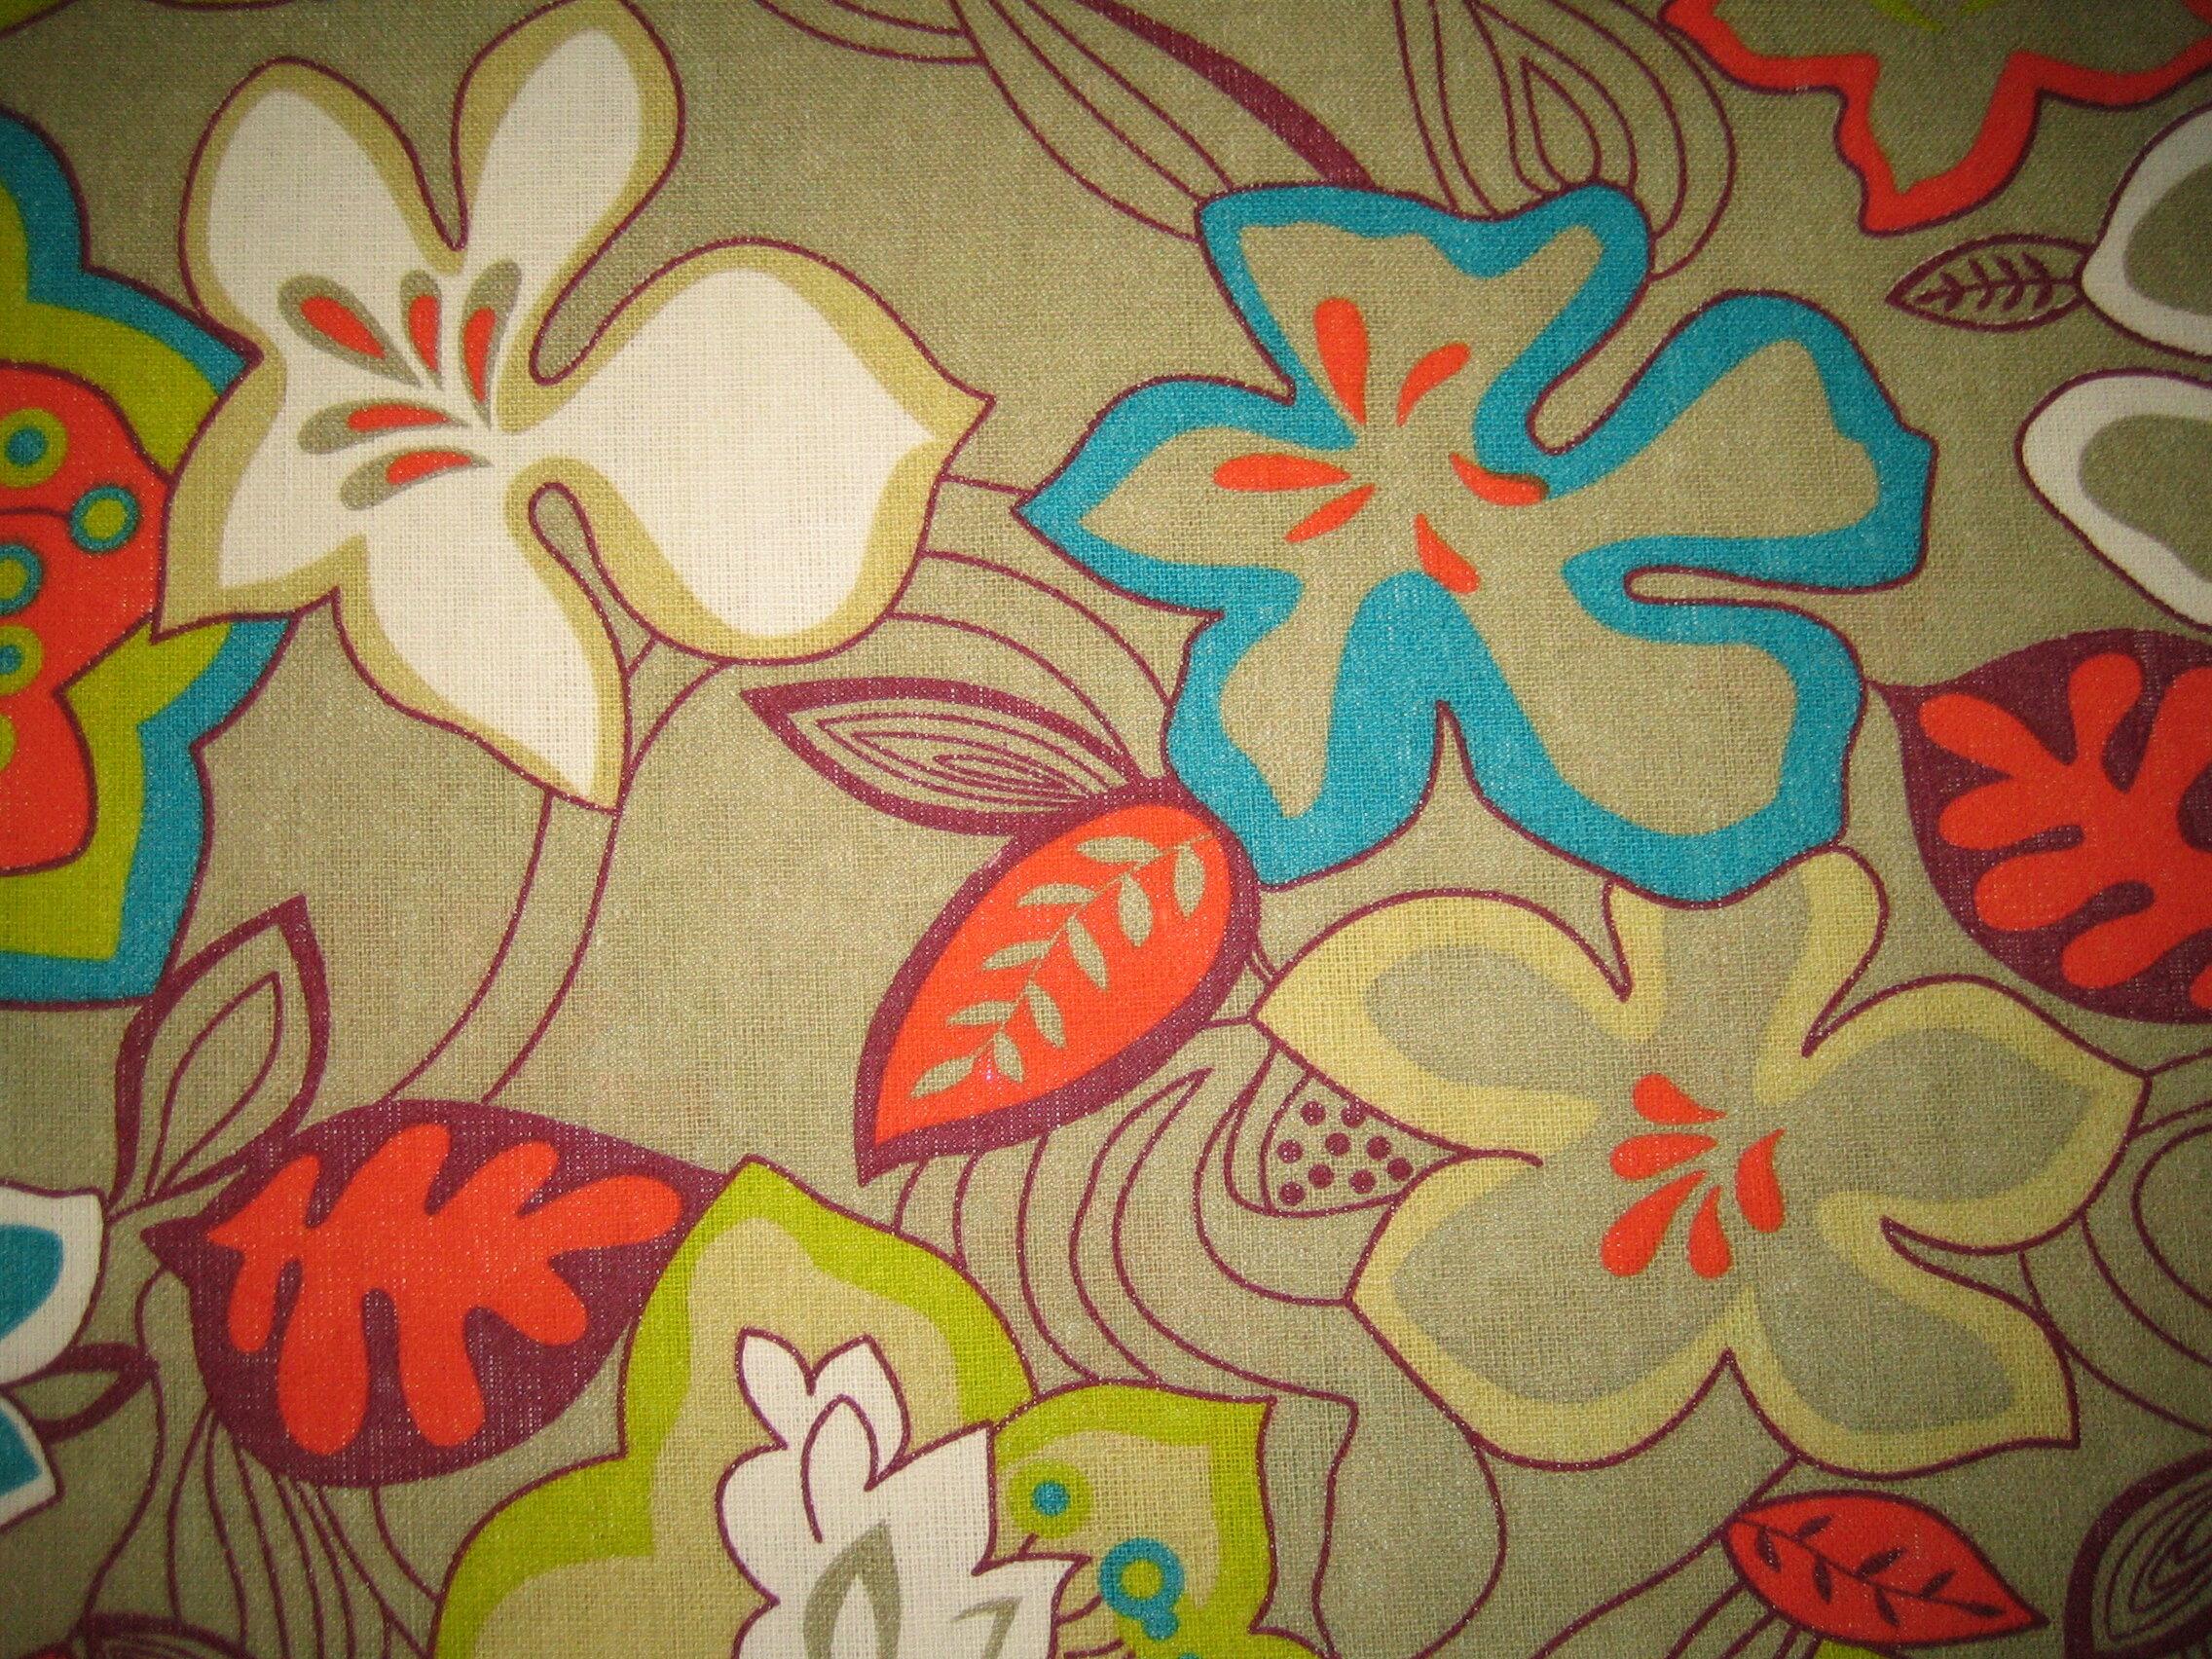 d_cembre_2010_060